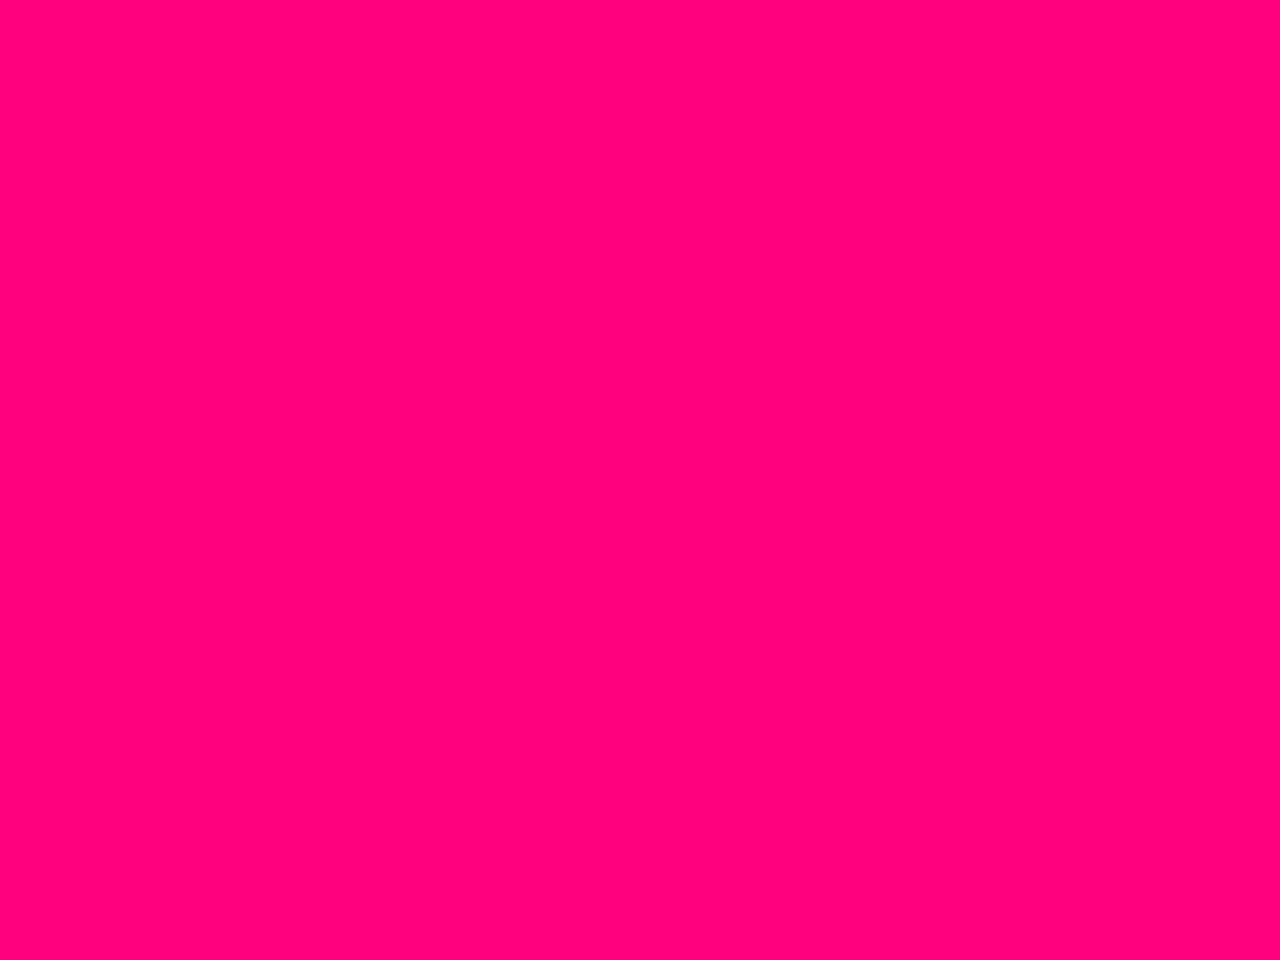 1280x960 Rose Solid Color Background